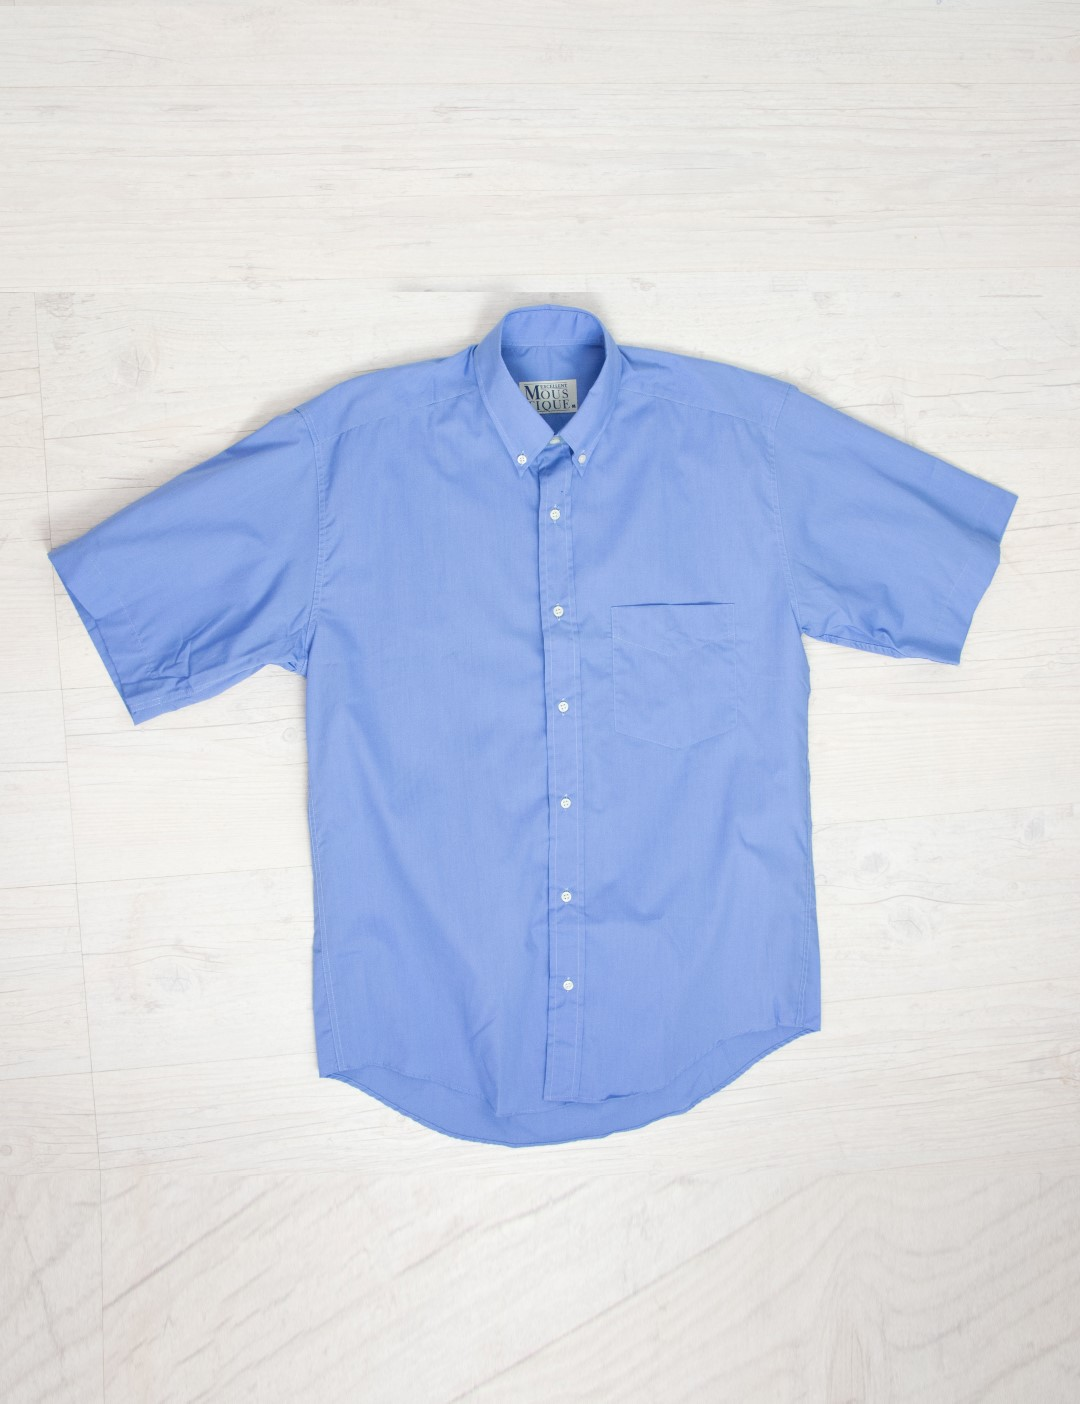 659aeda4241b Ανδρικό κοντομάνικο πουκάμισο σιέλ 94655